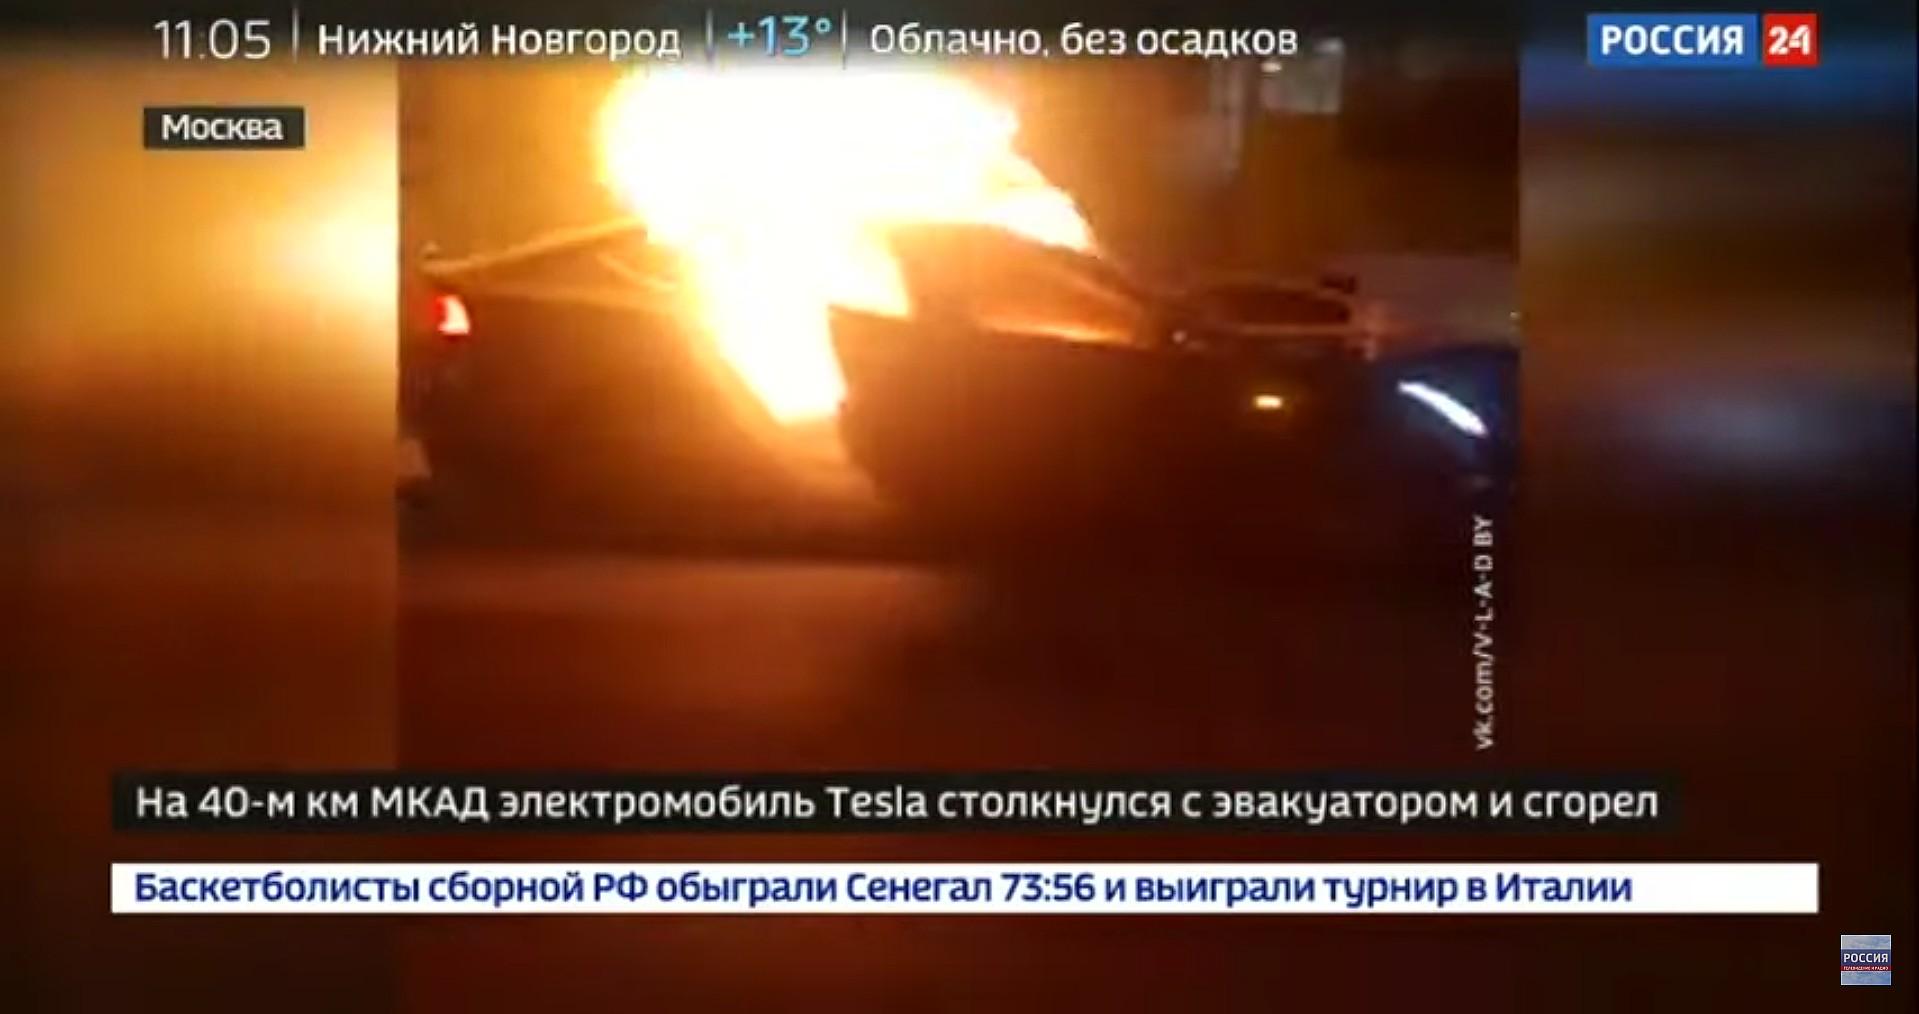 Tesla Model 3 >> Tesla Model 3 fire in Moscow: What we know so far